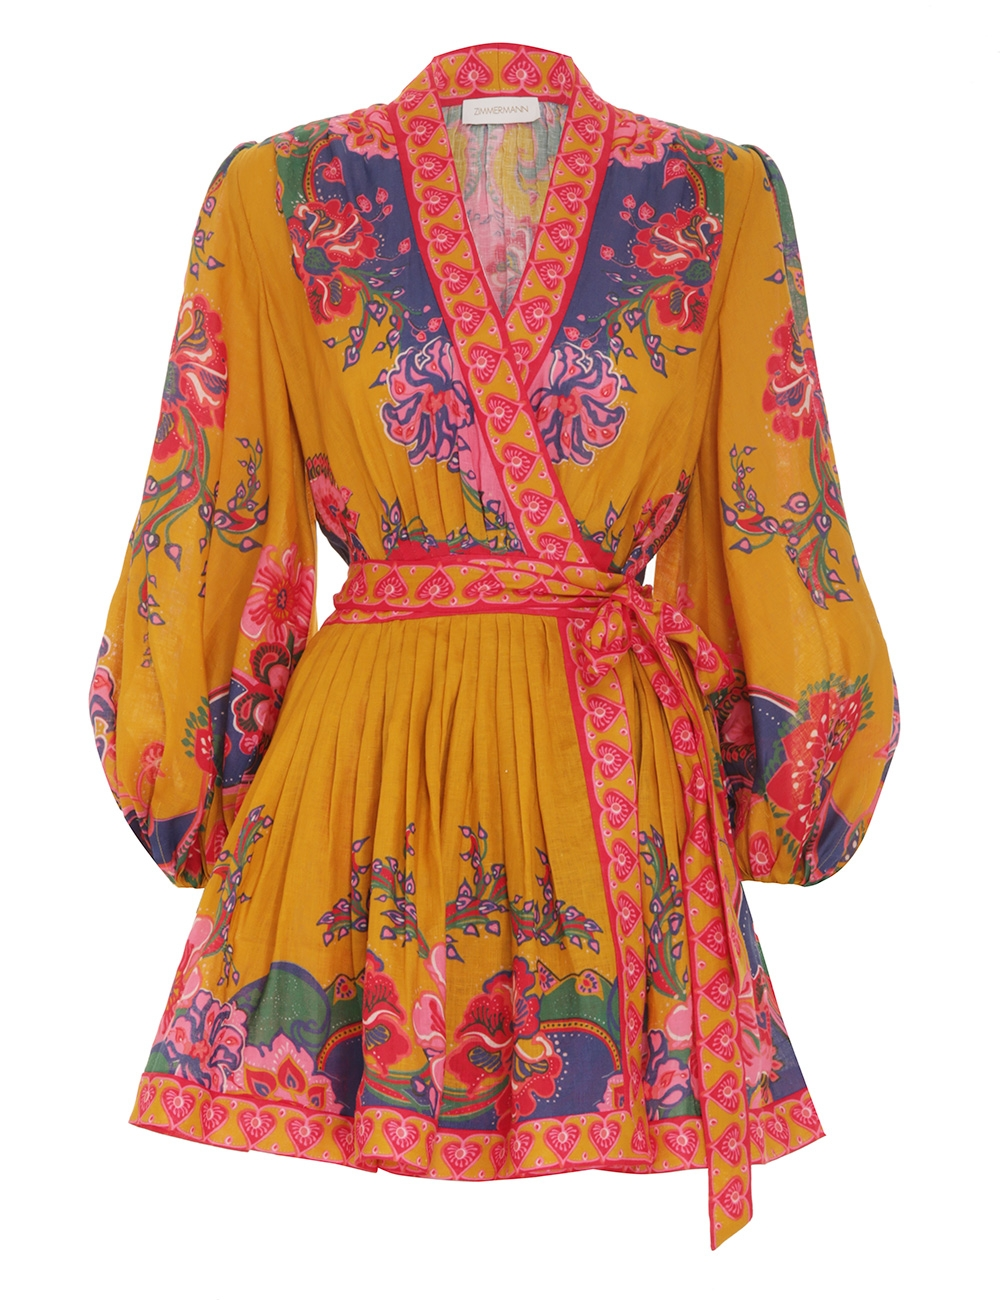 The Lovestruck Wrap Mini Dress